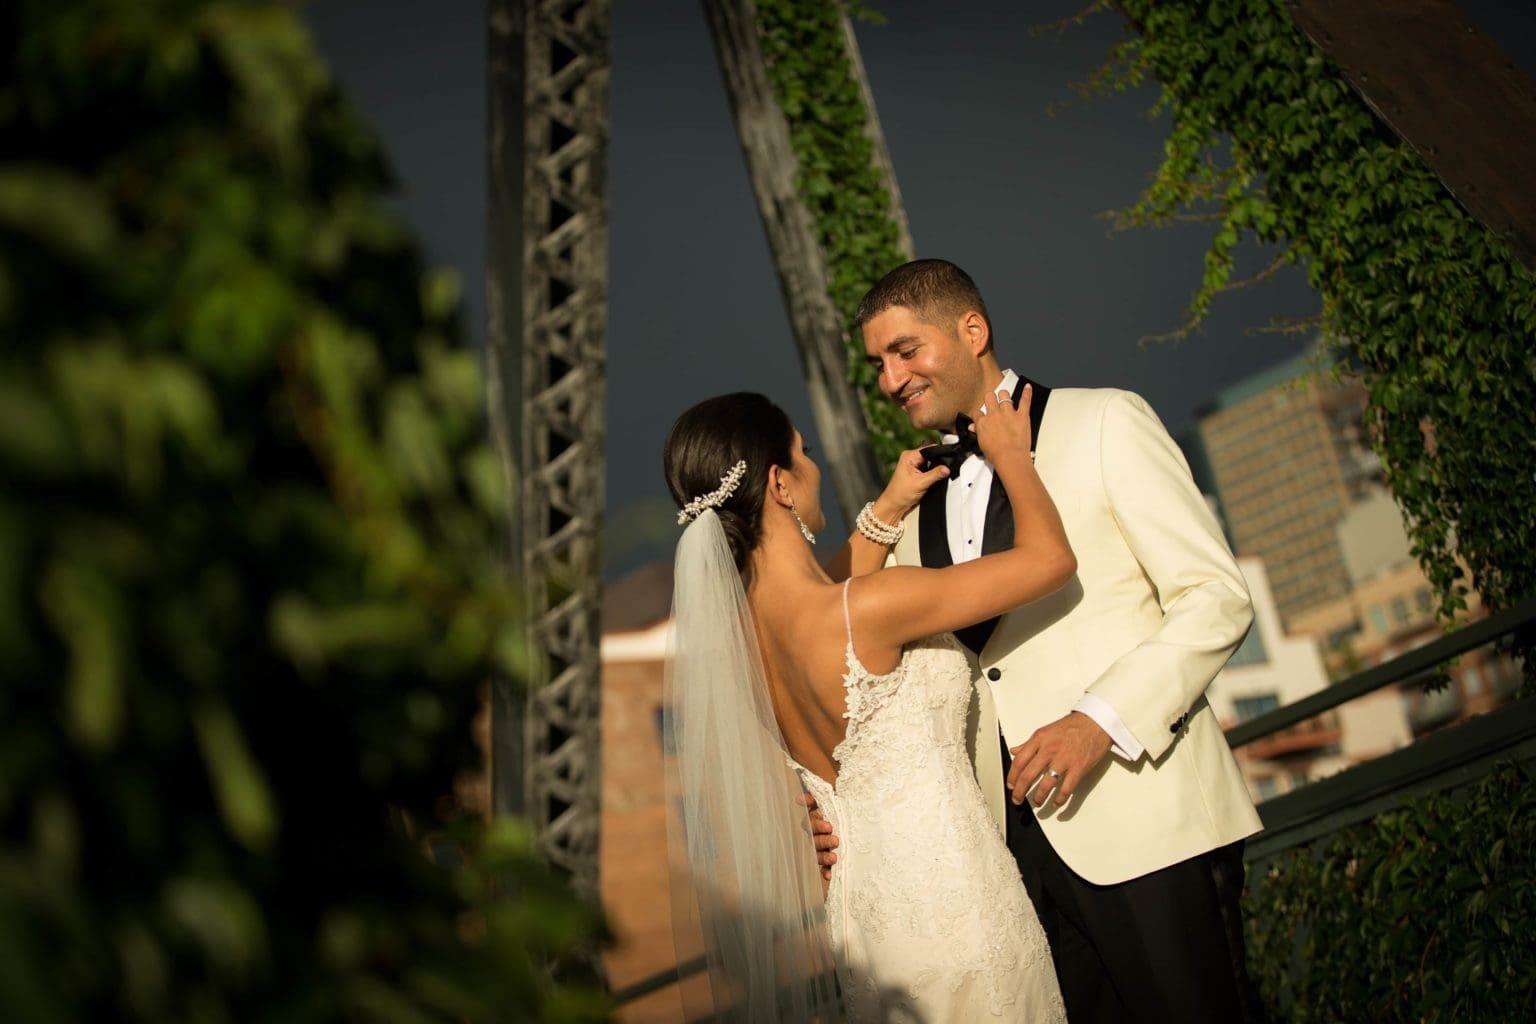 Marika adjusts Dean's bowtie on the Wynkoop Street Bridge during their wedding portraits in Denver.